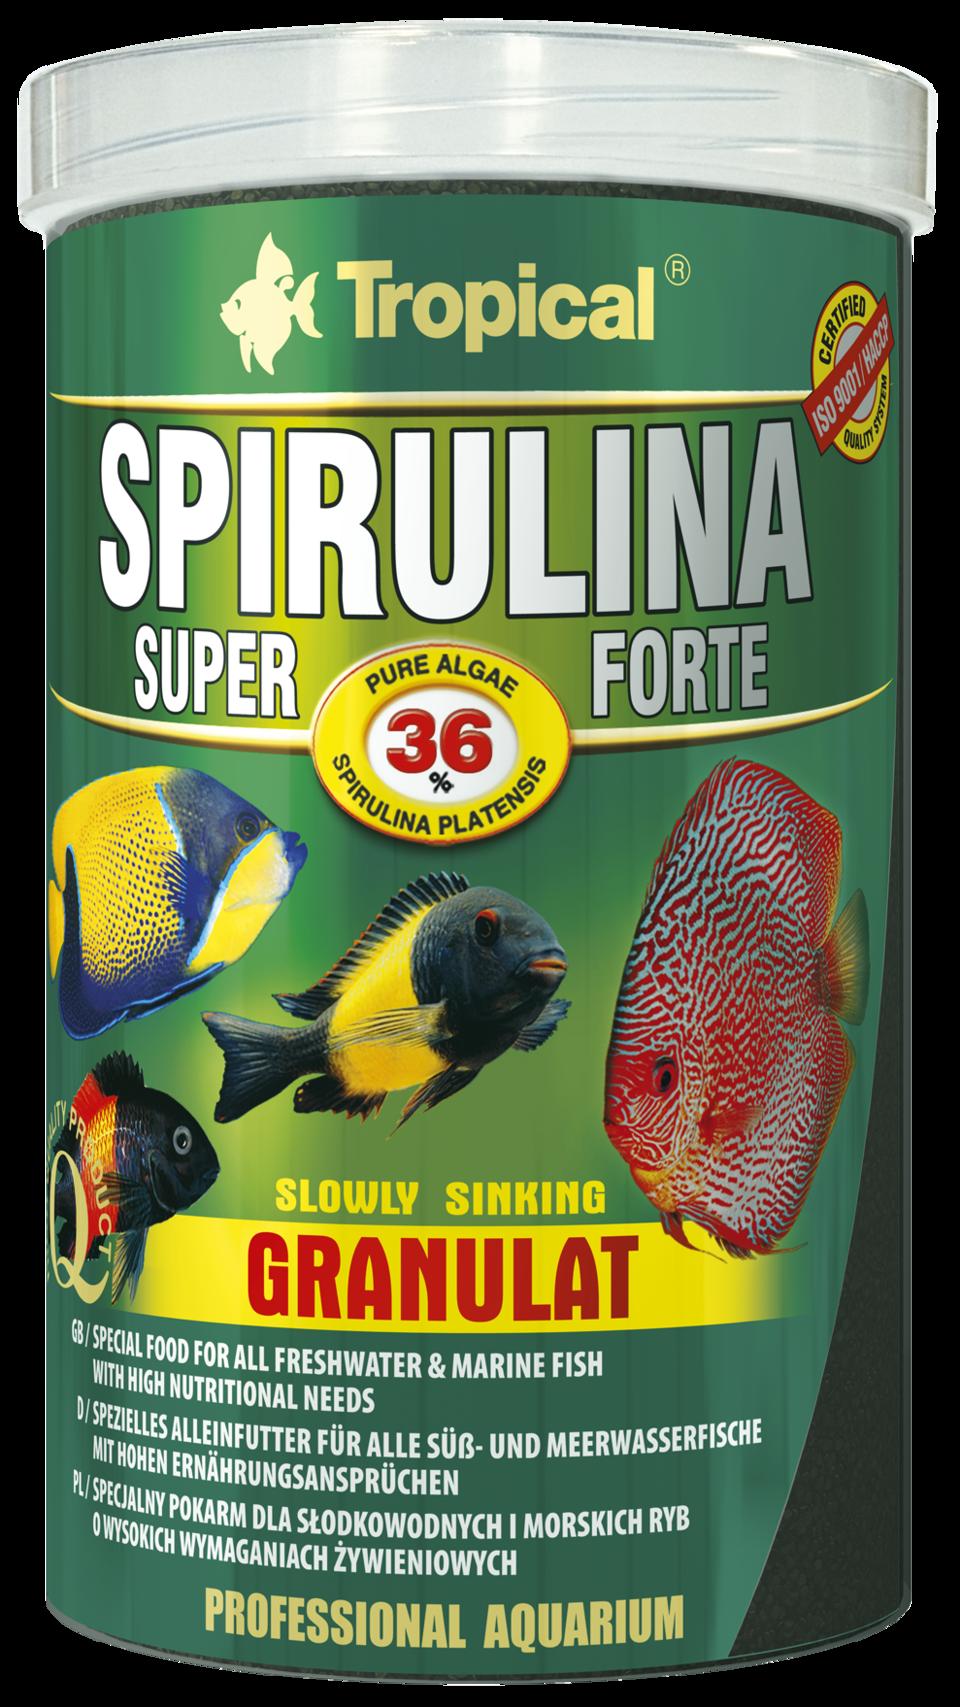 csm_super-spirulina-forte-granulat_1000_9f8d280bc1